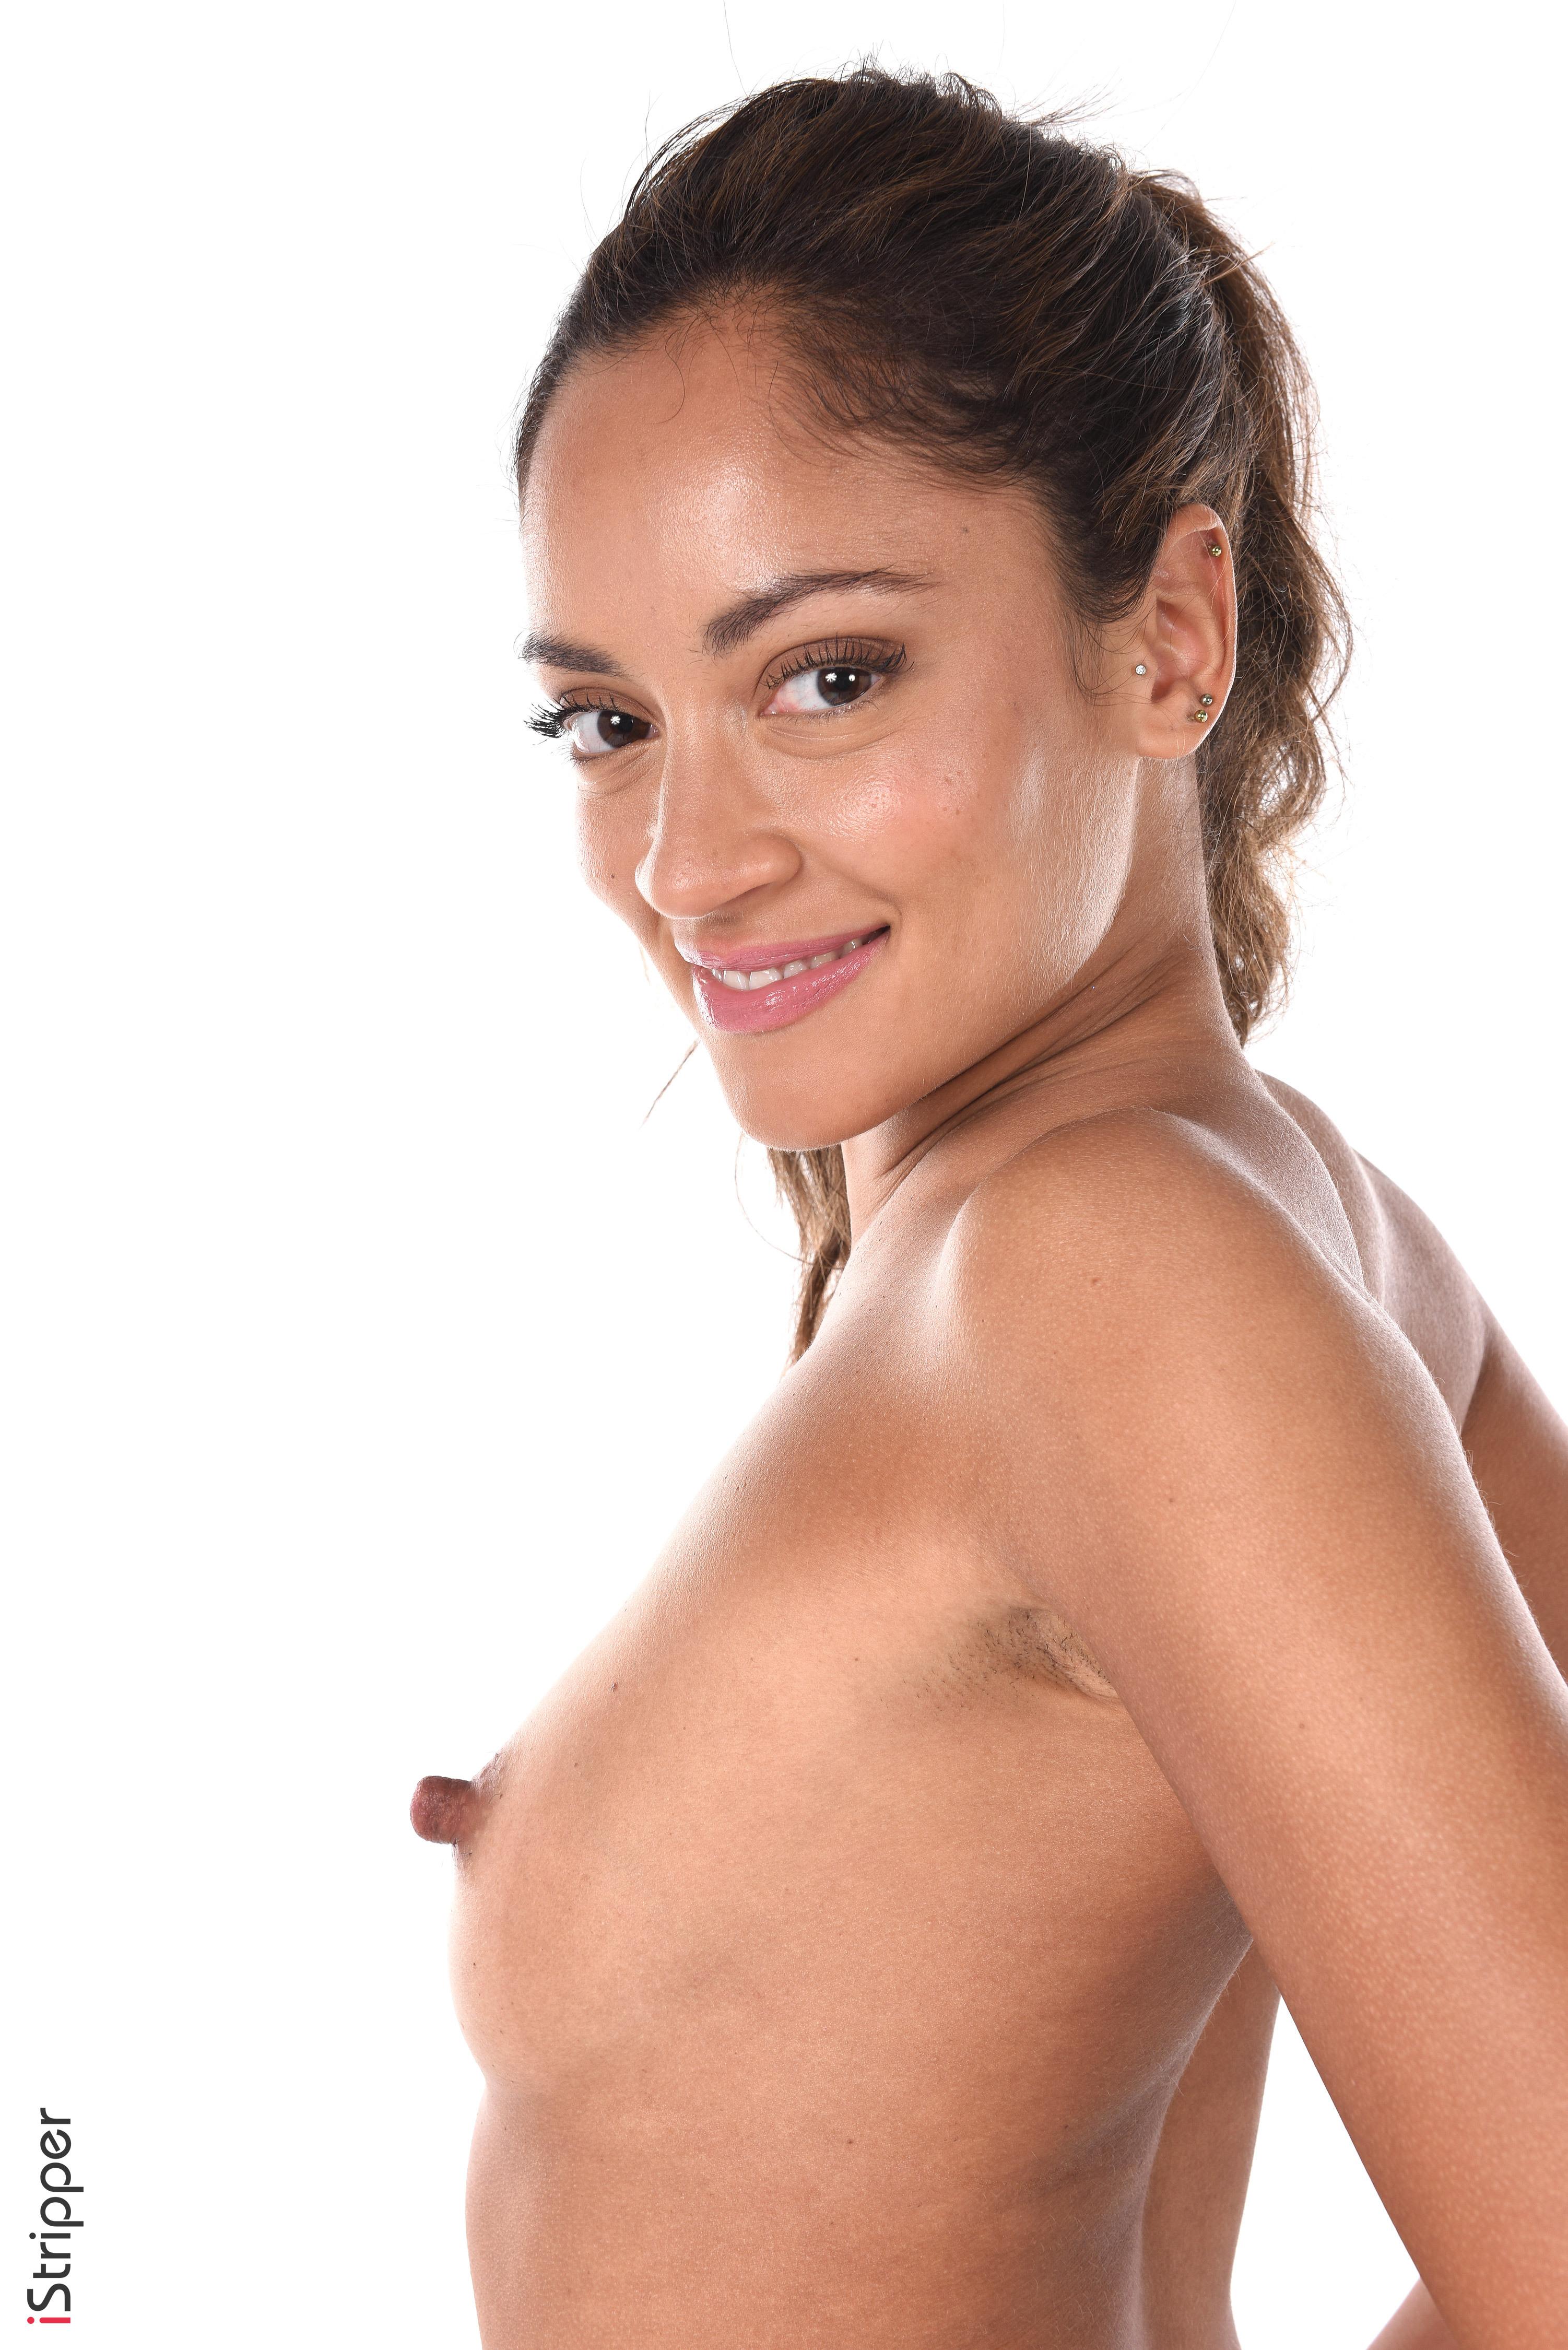 hot sexy woman wallpaper